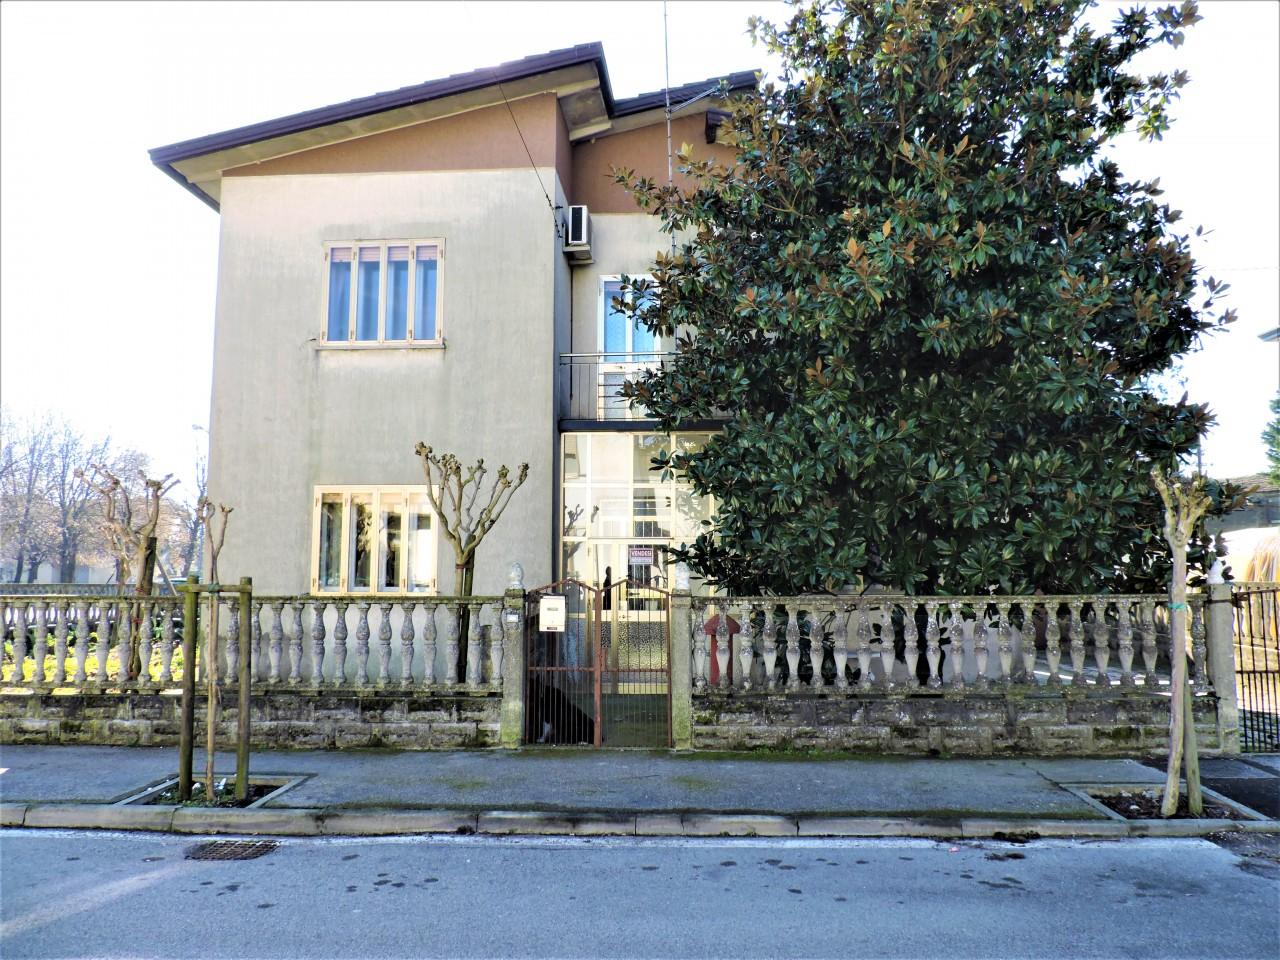 Spaziosa casa singola con giardino e garage